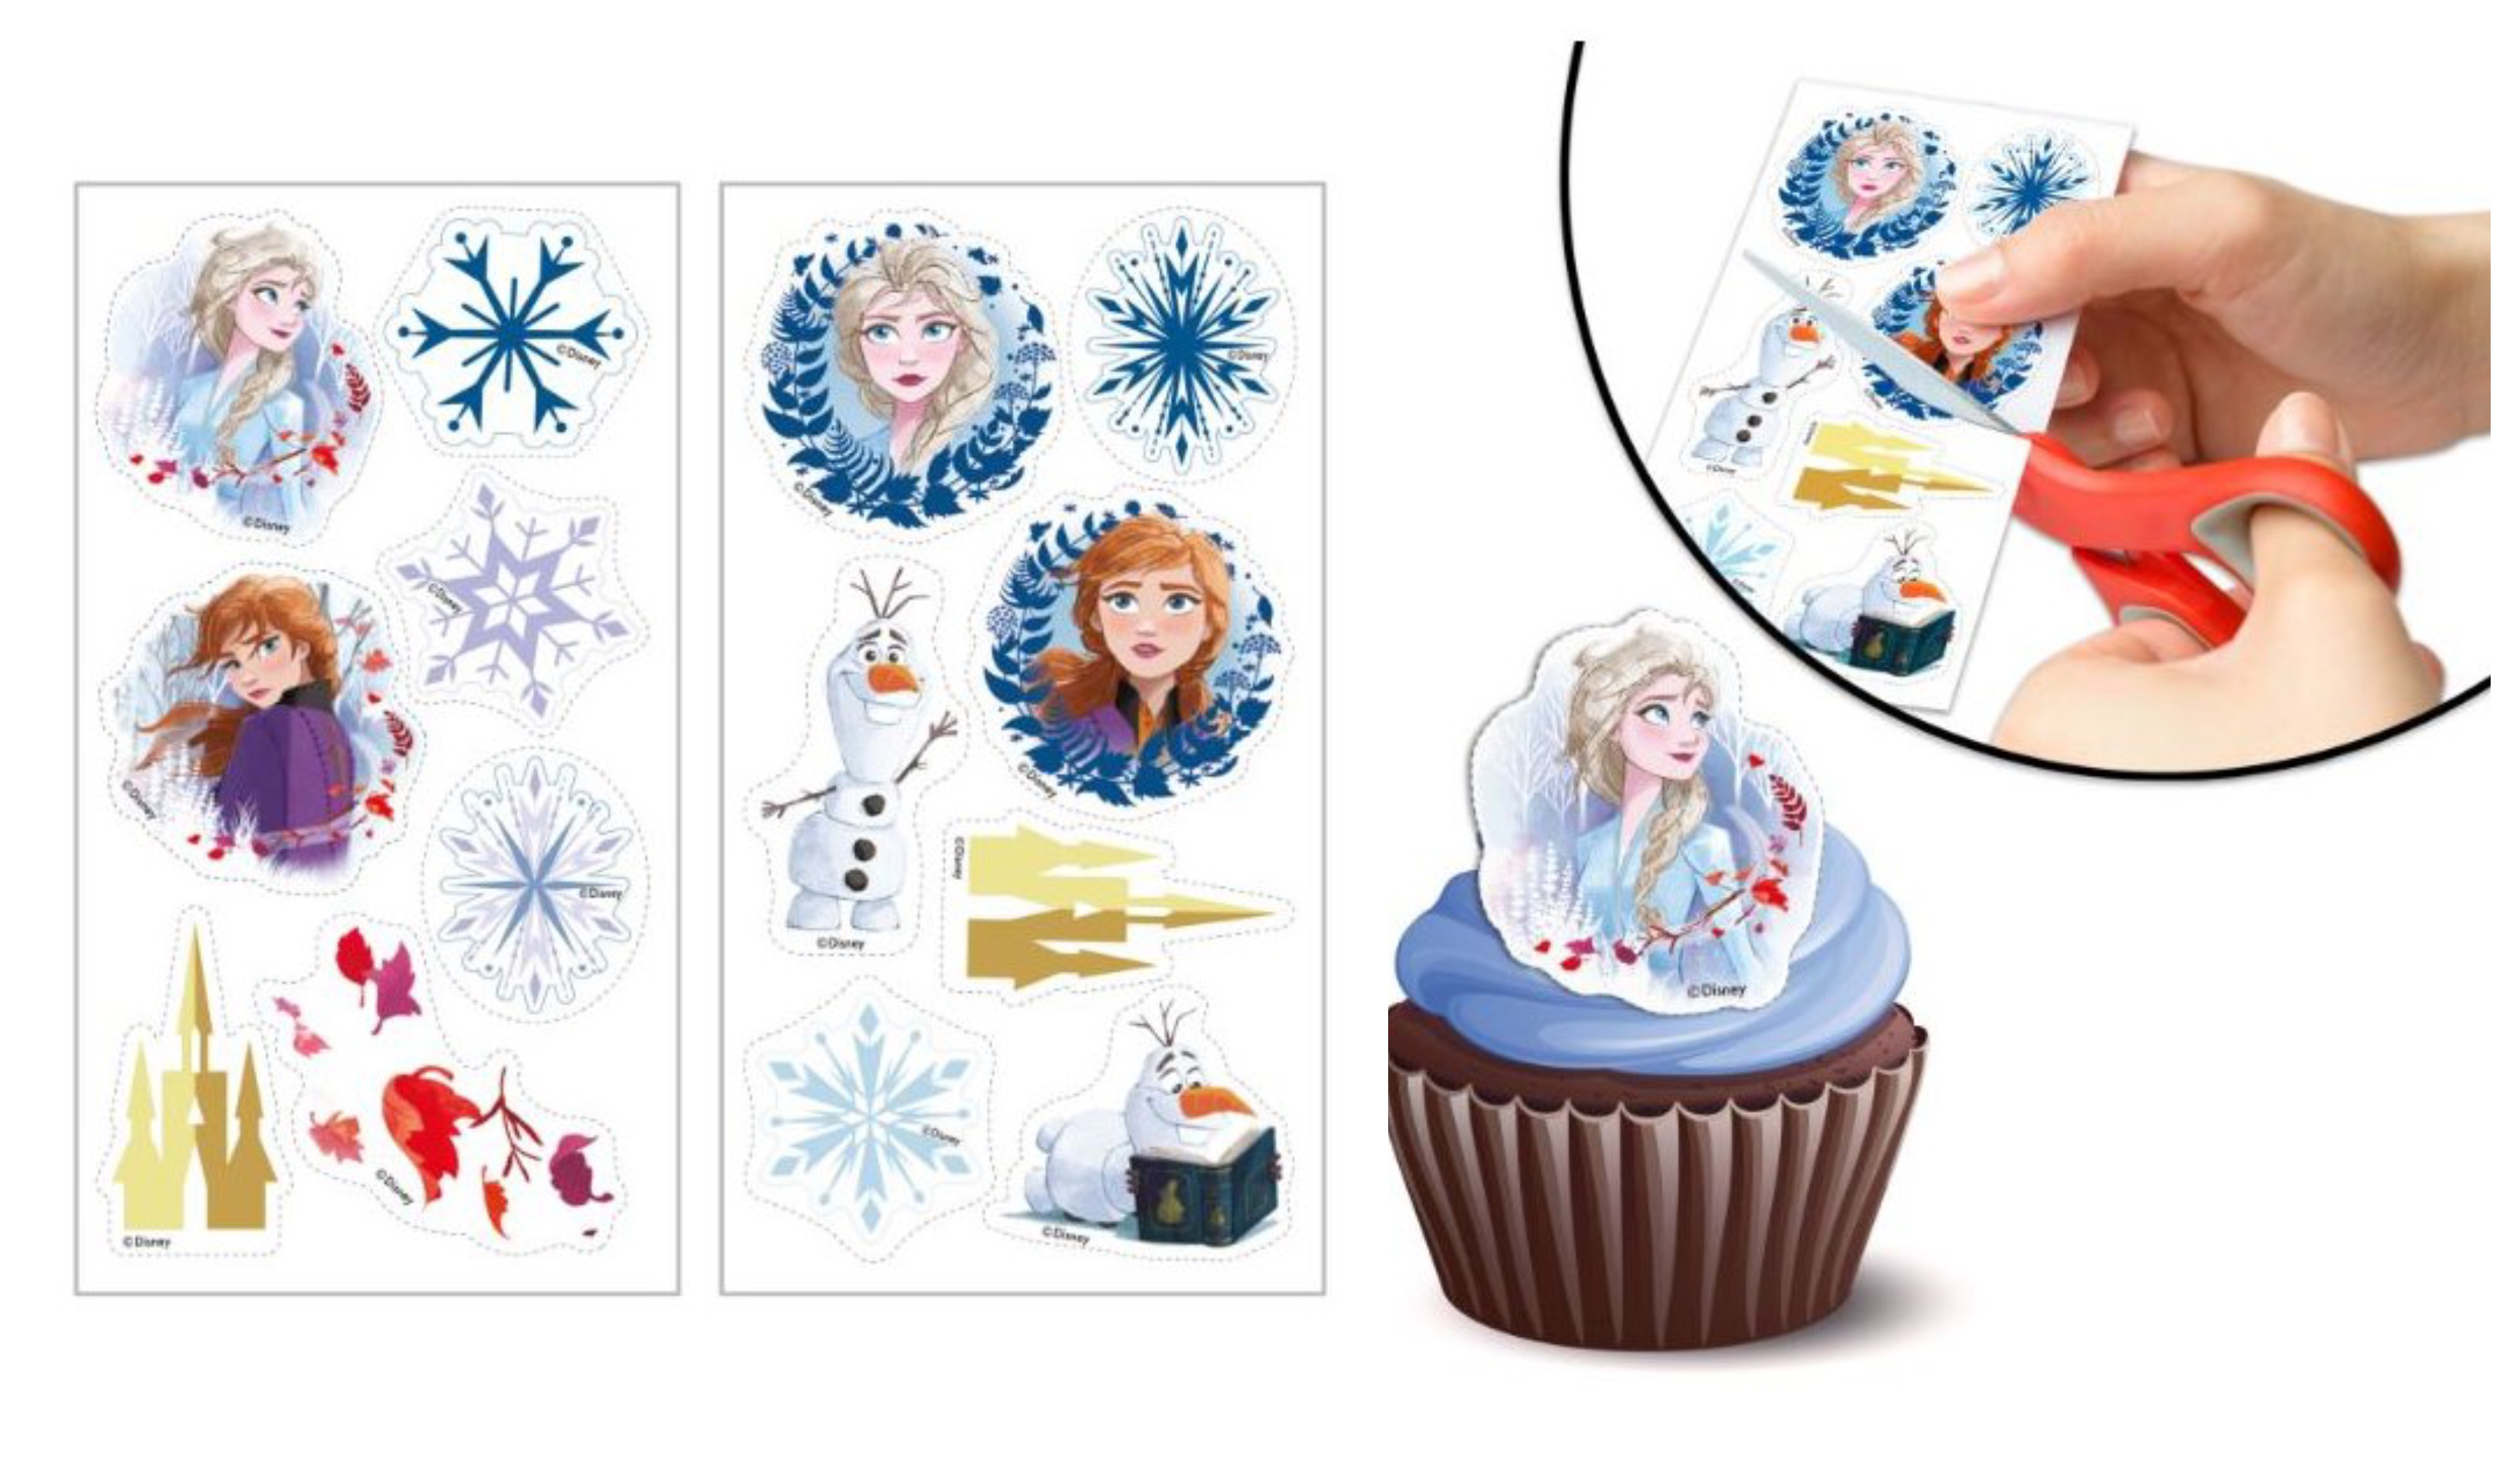 frozen 2 muffins sukkerprint - Lav nemt en Frost kage med Frost kageprint